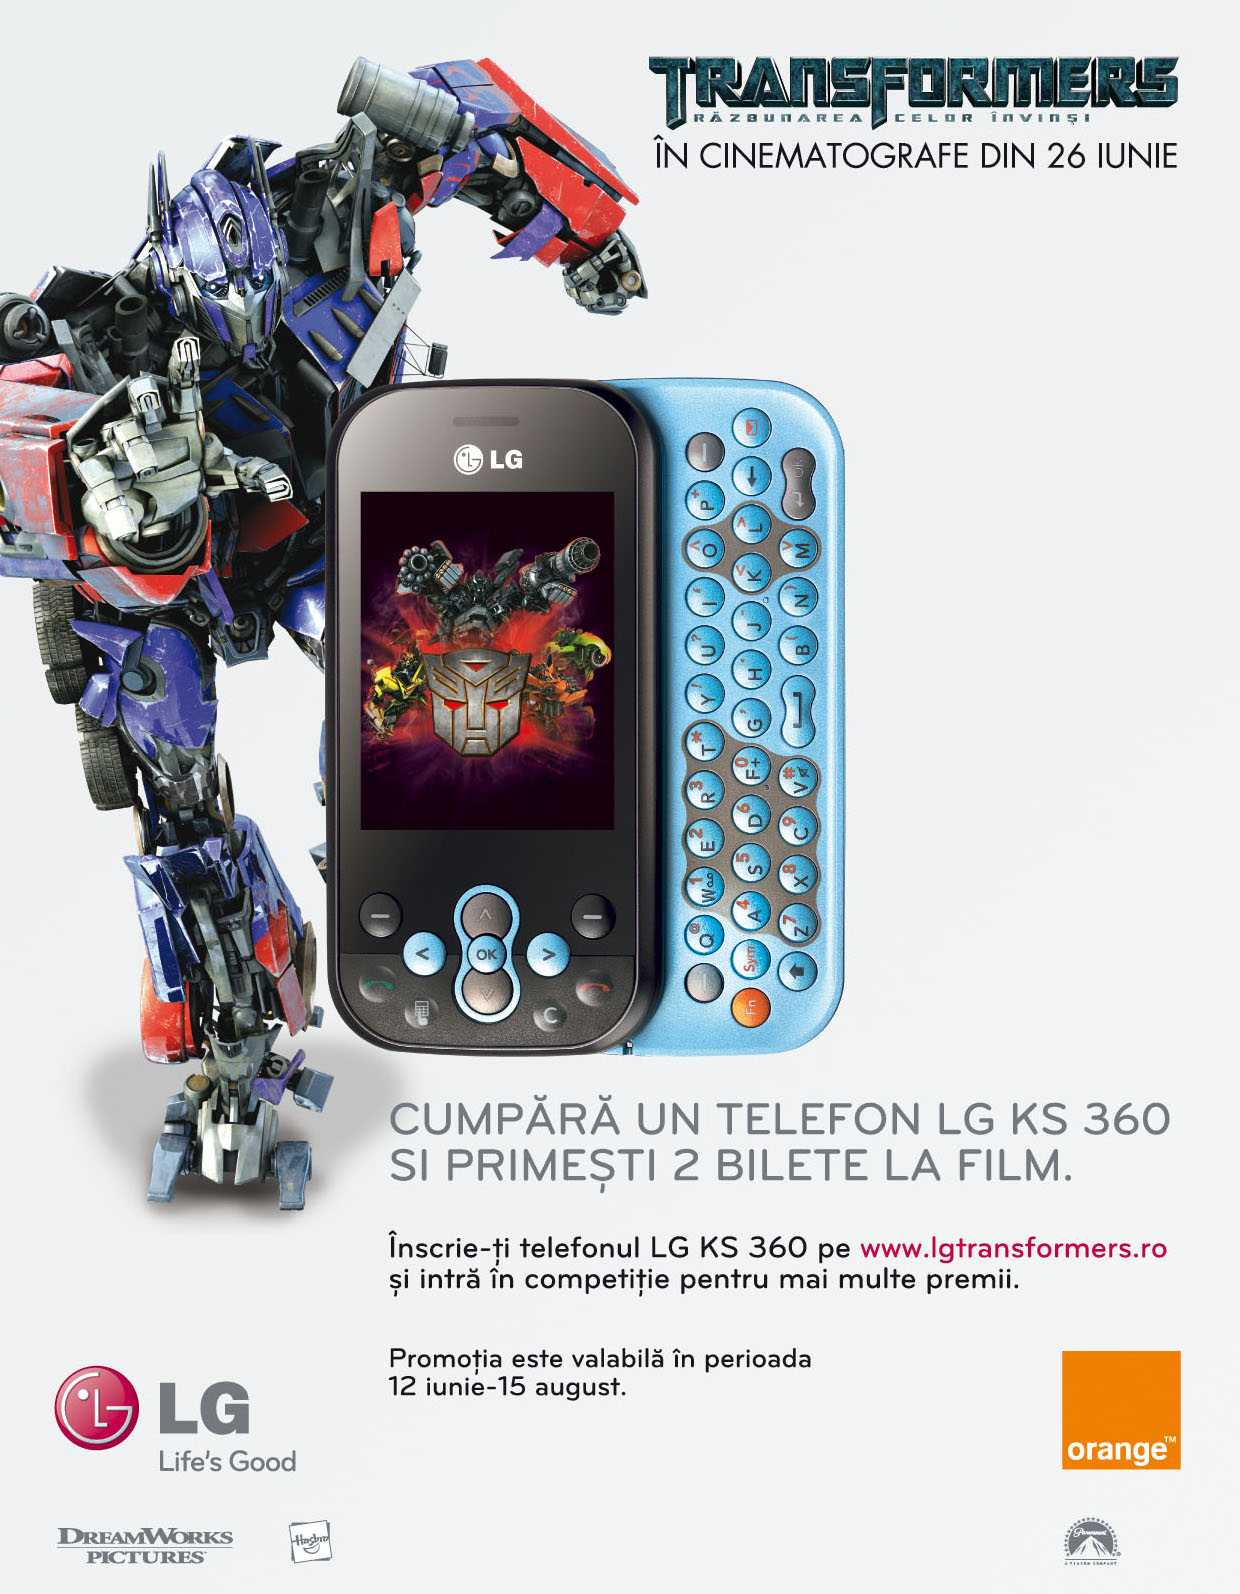 LG Transformers